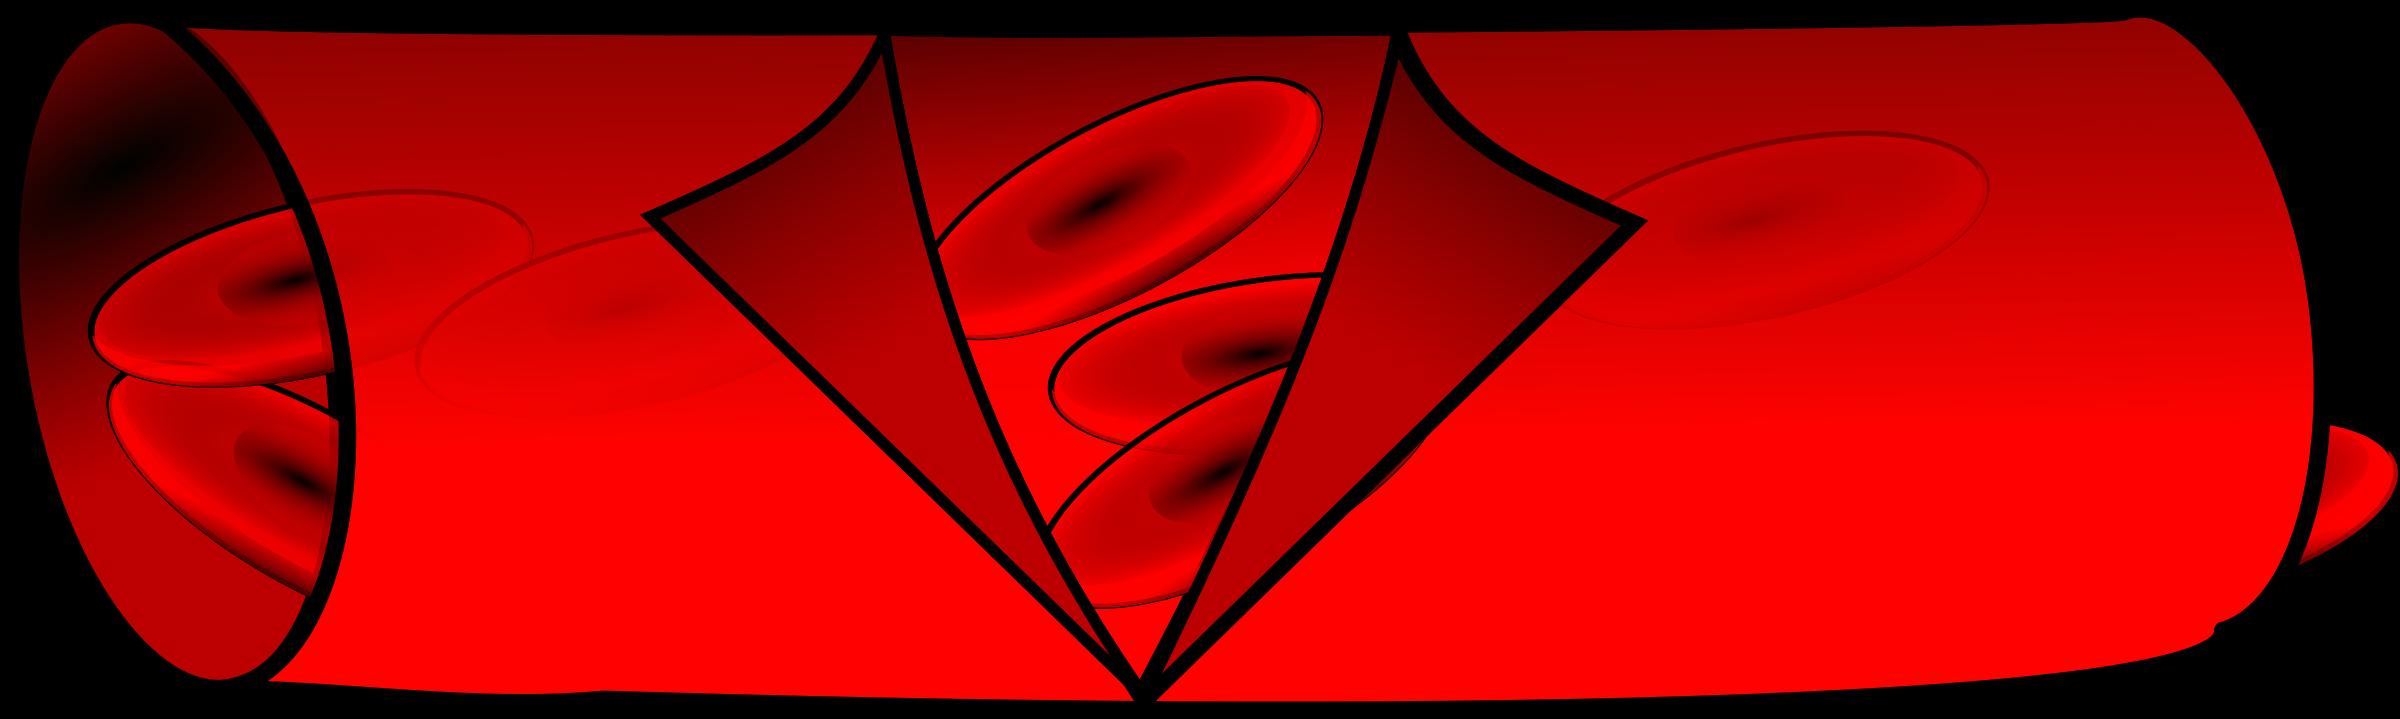 Blood Vessel Clipart.